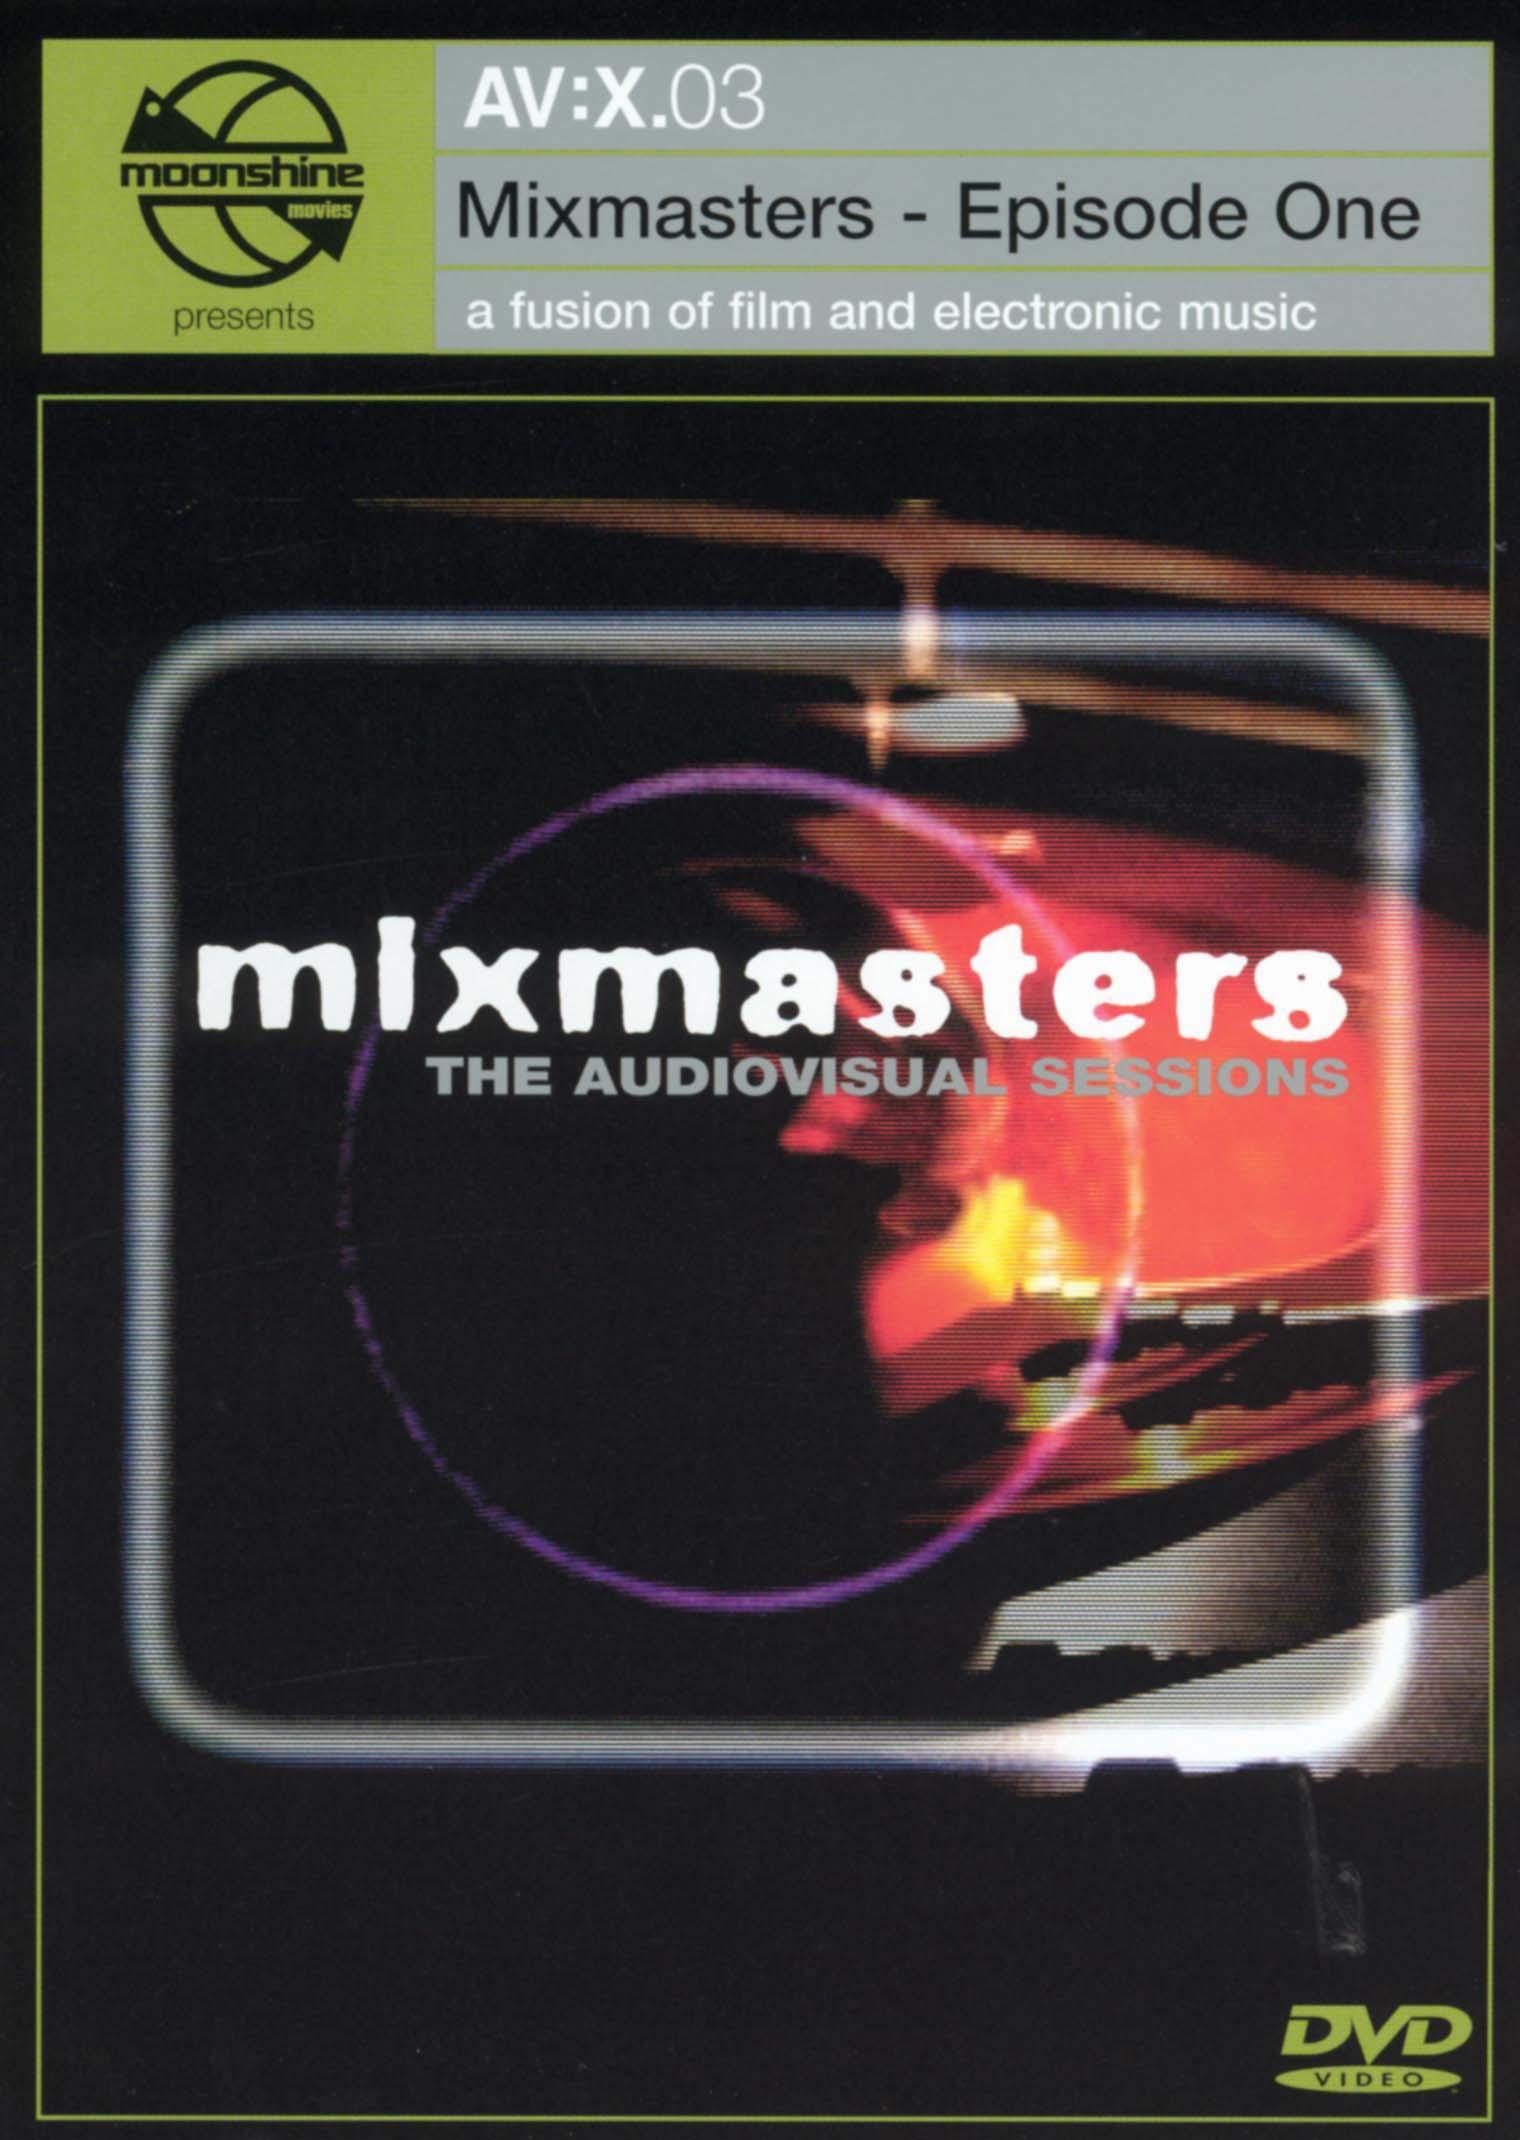 AV:X.03 - Mixmasters